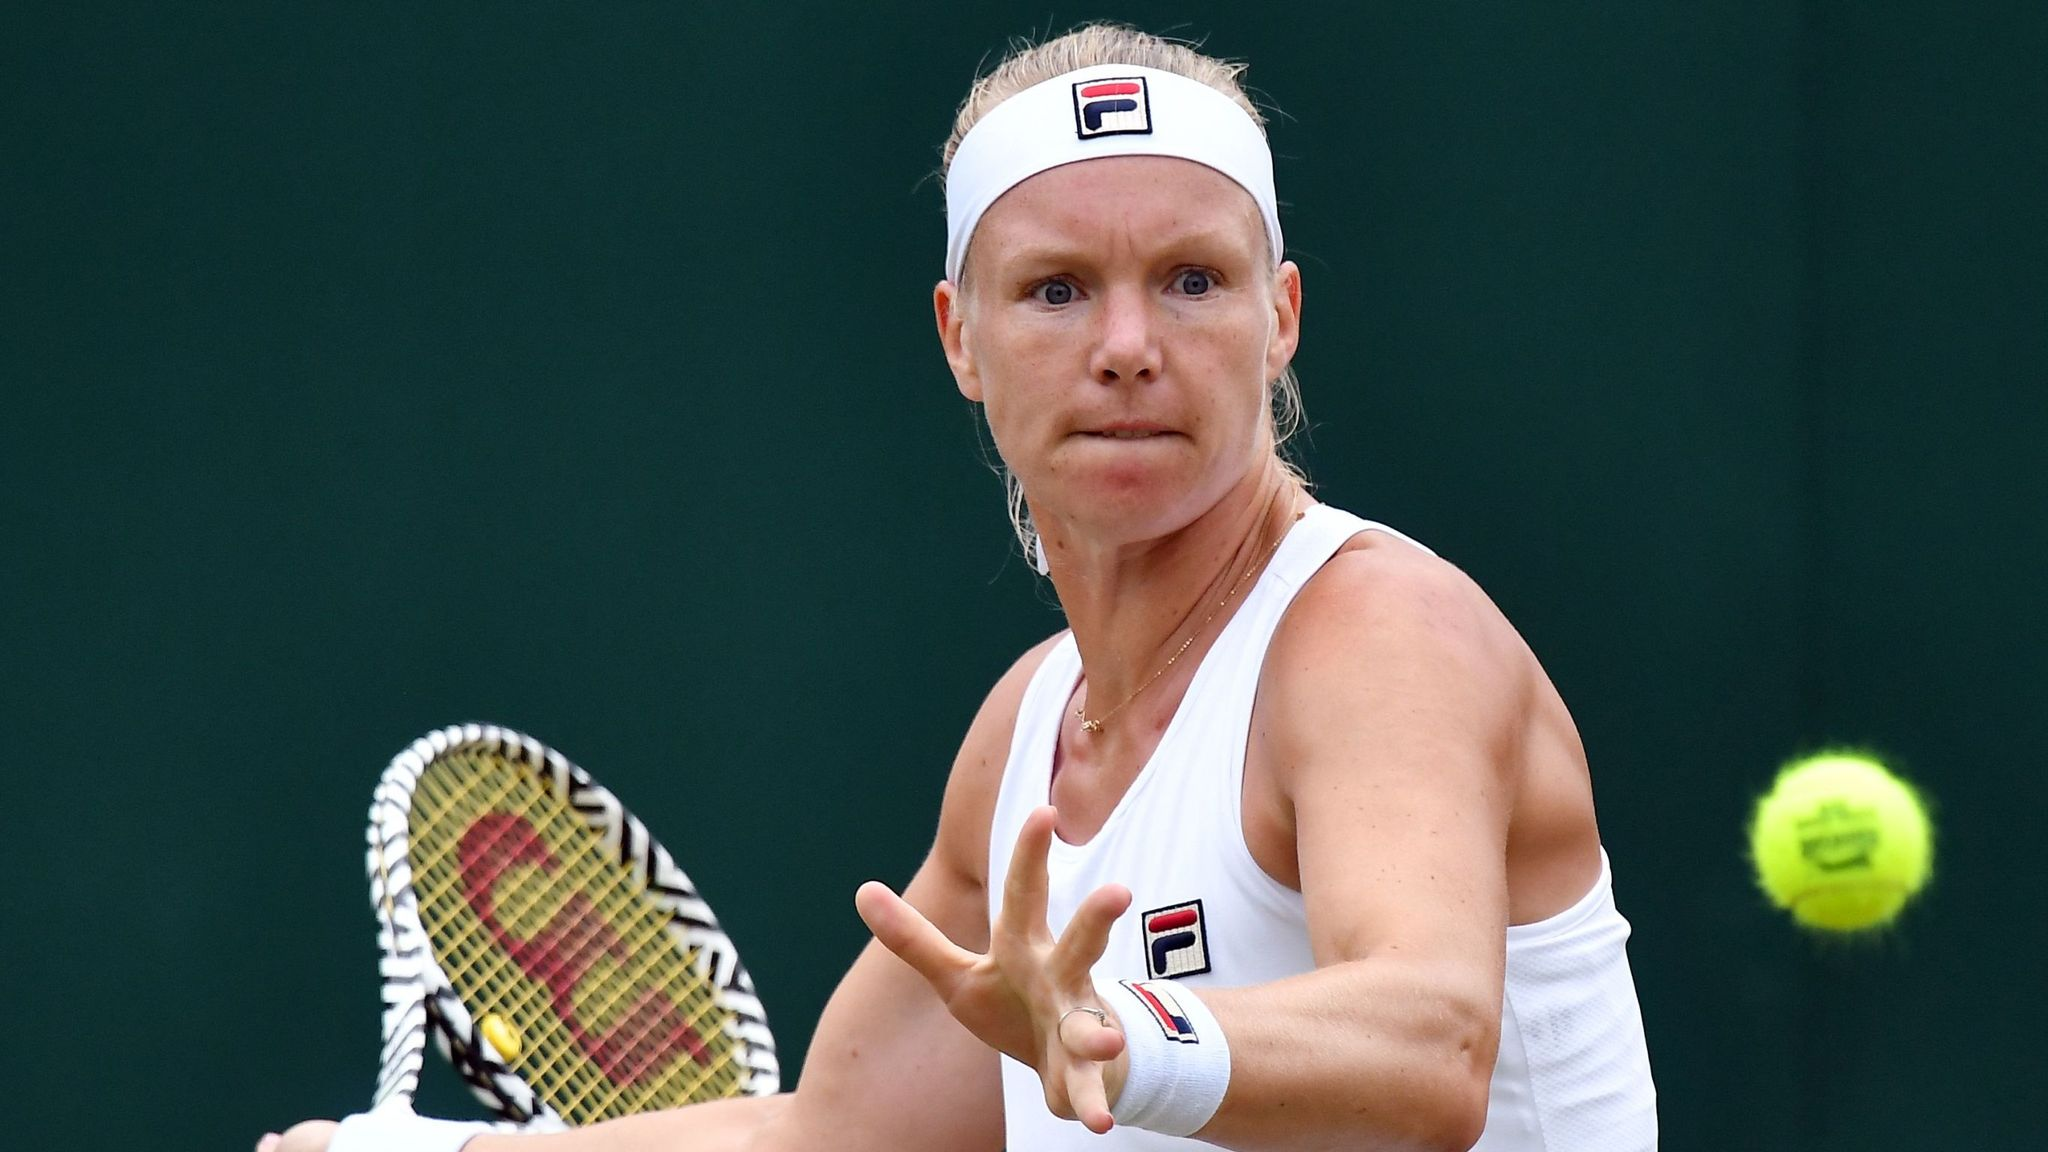 Anastasija Sevastova rallies from a set and a break down to win Baltic Open